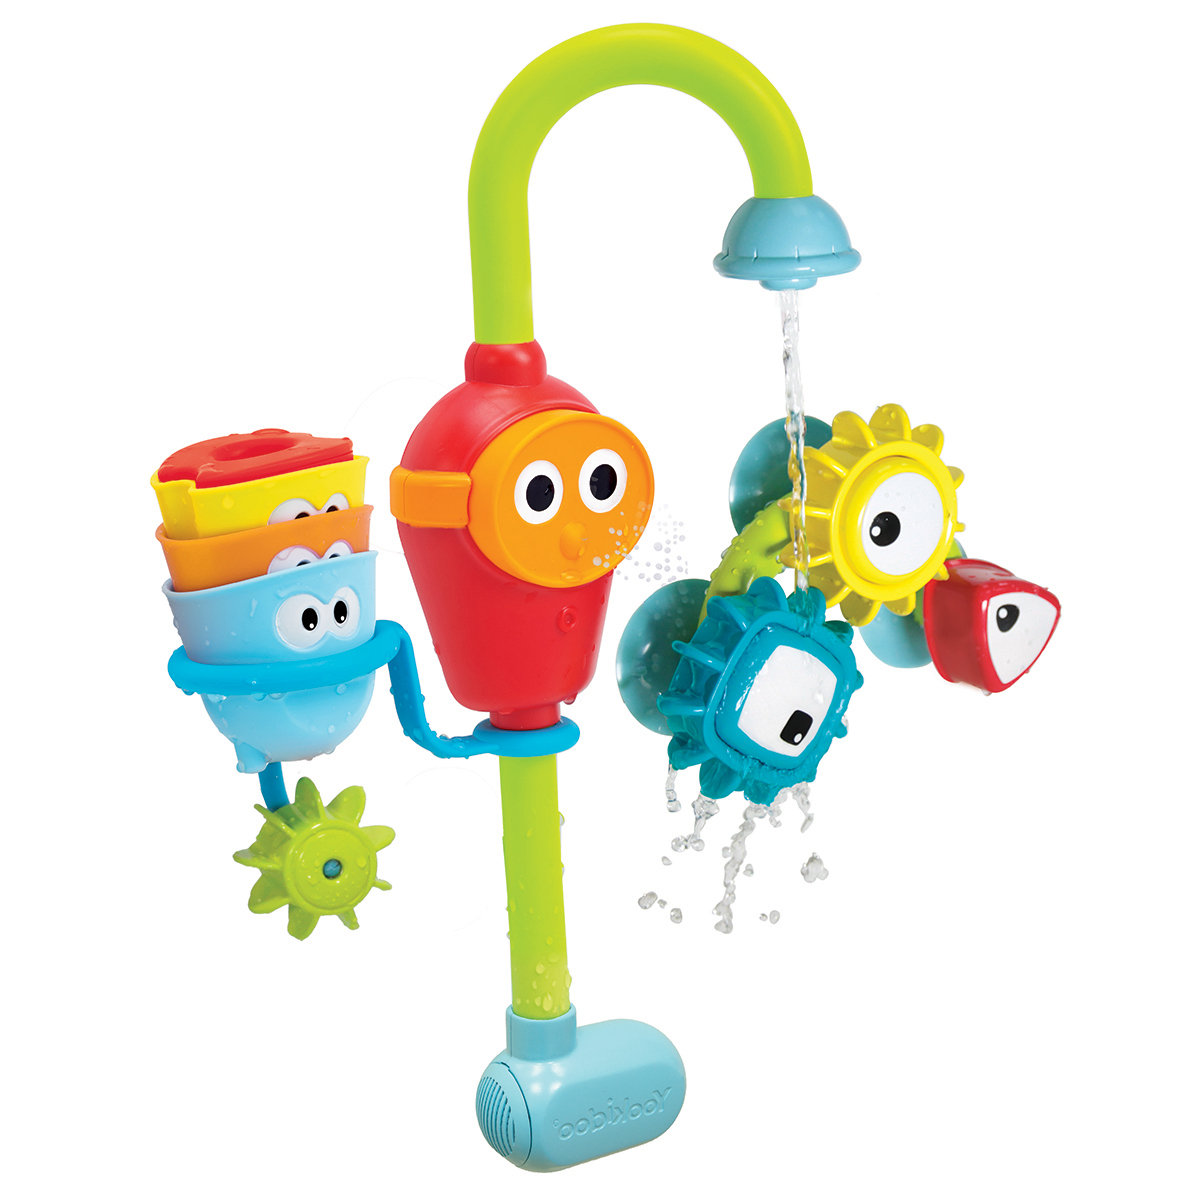 4c181f7623e300 Badspeelgoed - Spin 'N' Sort spout Pro. Yookidoo